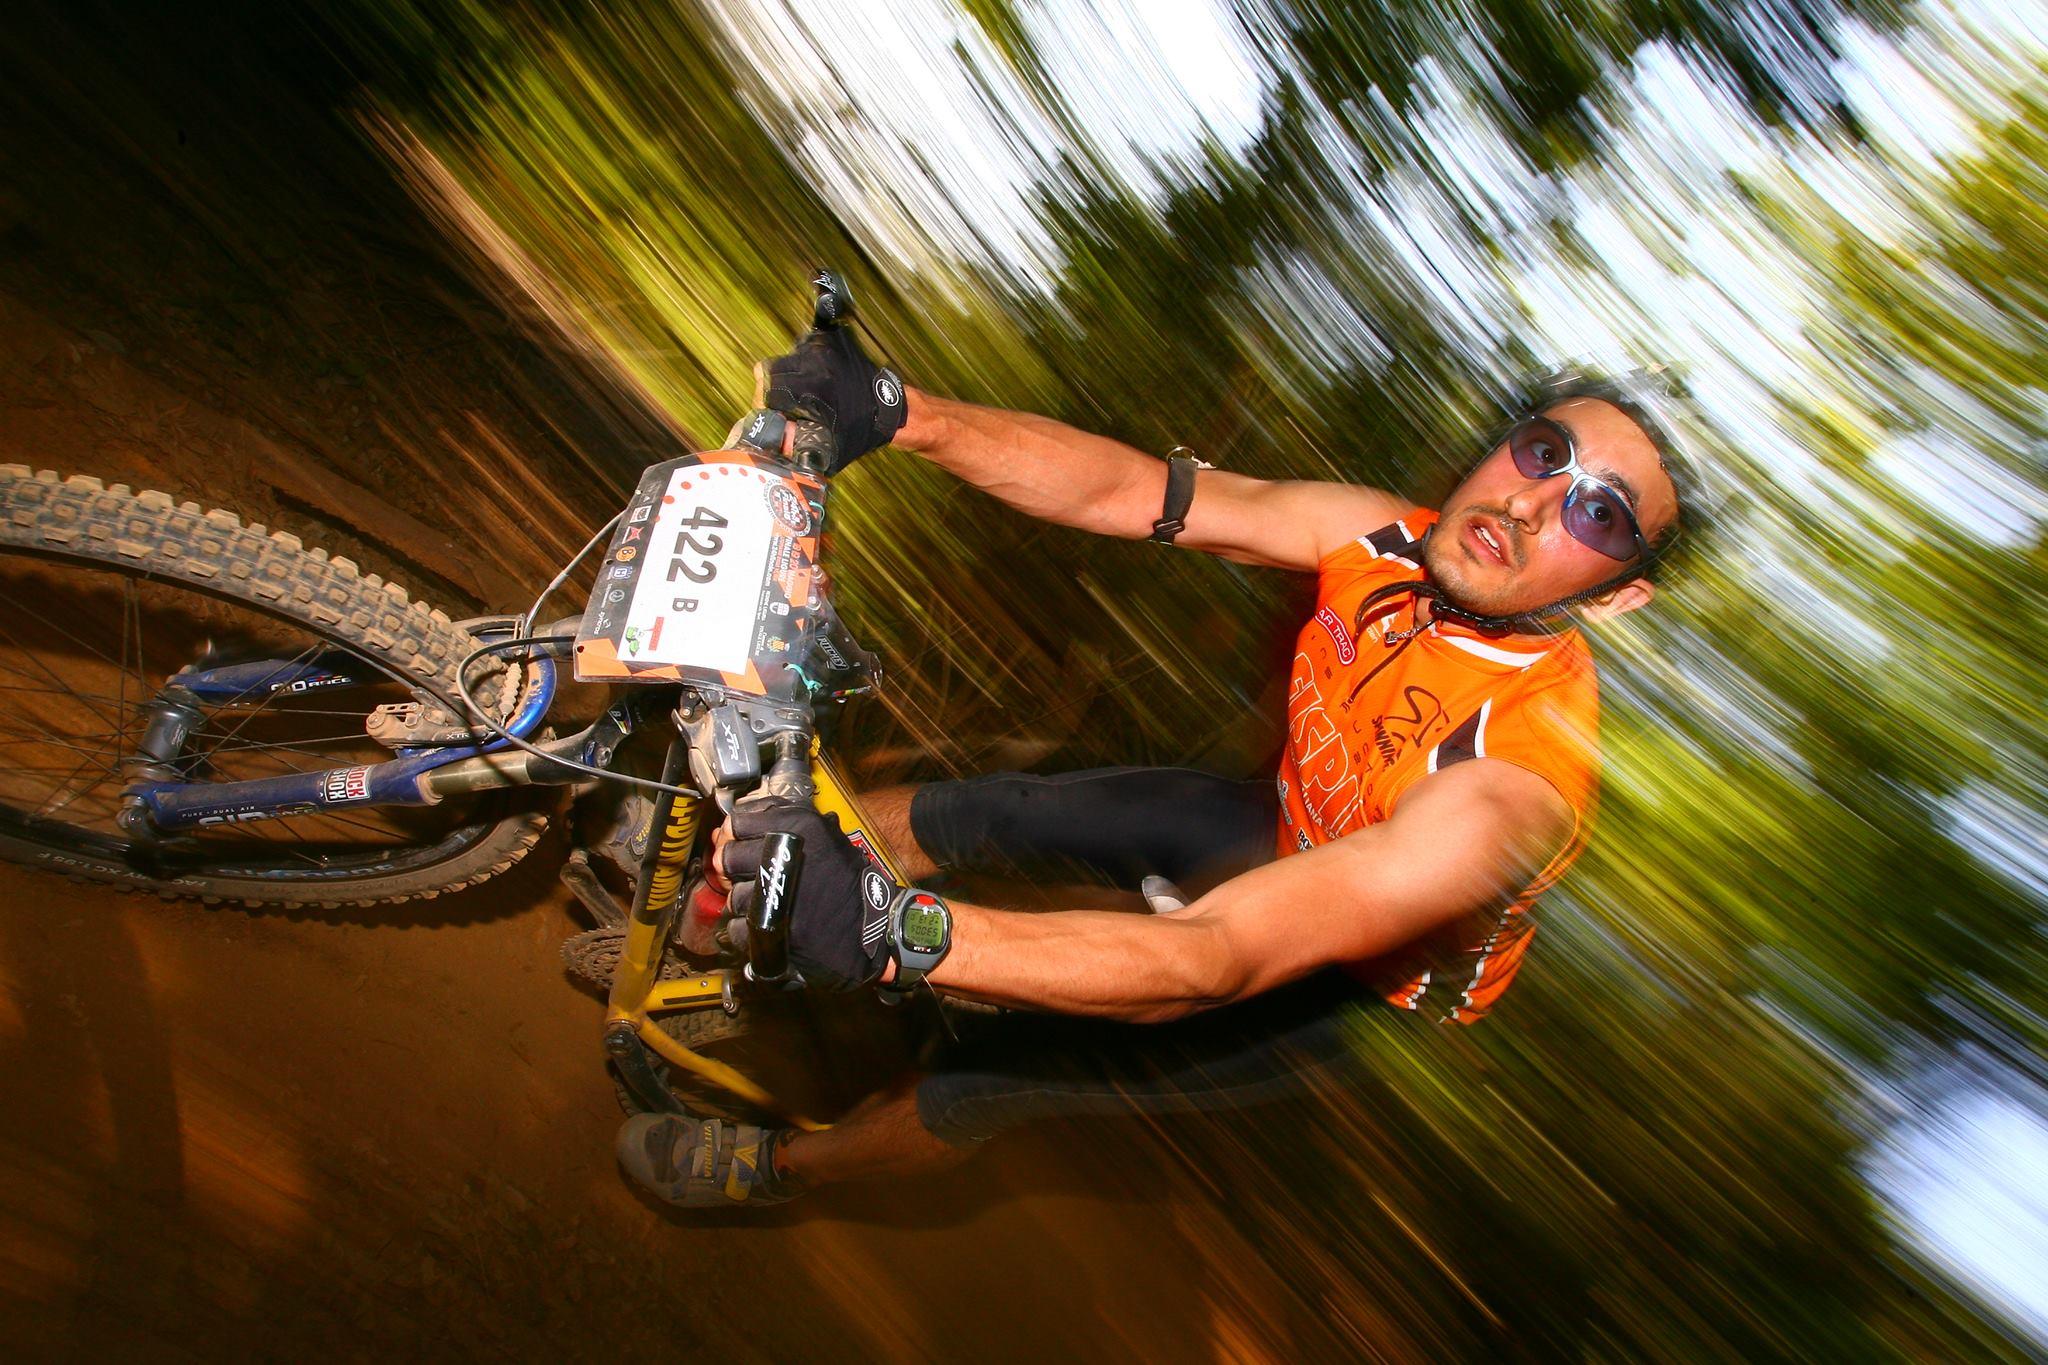 http://www.pedale-fidentino.it/wp-content/uploads/2016/02/Bellarmino.jpg